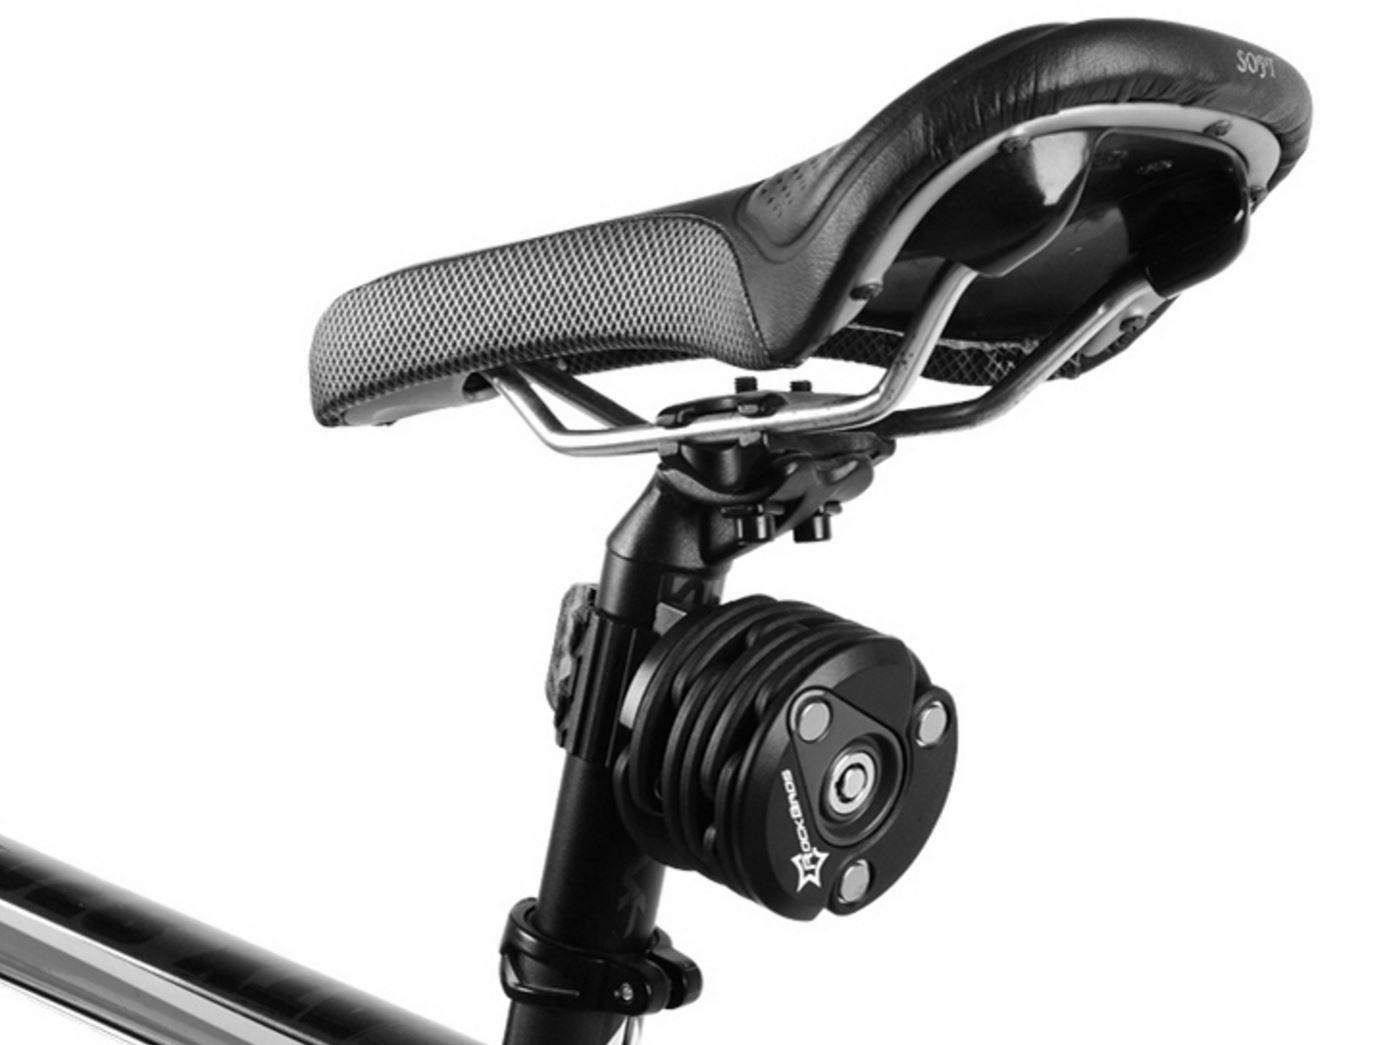 best lightweight bike lock best way to lock a bike. Black Bedroom Furniture Sets. Home Design Ideas